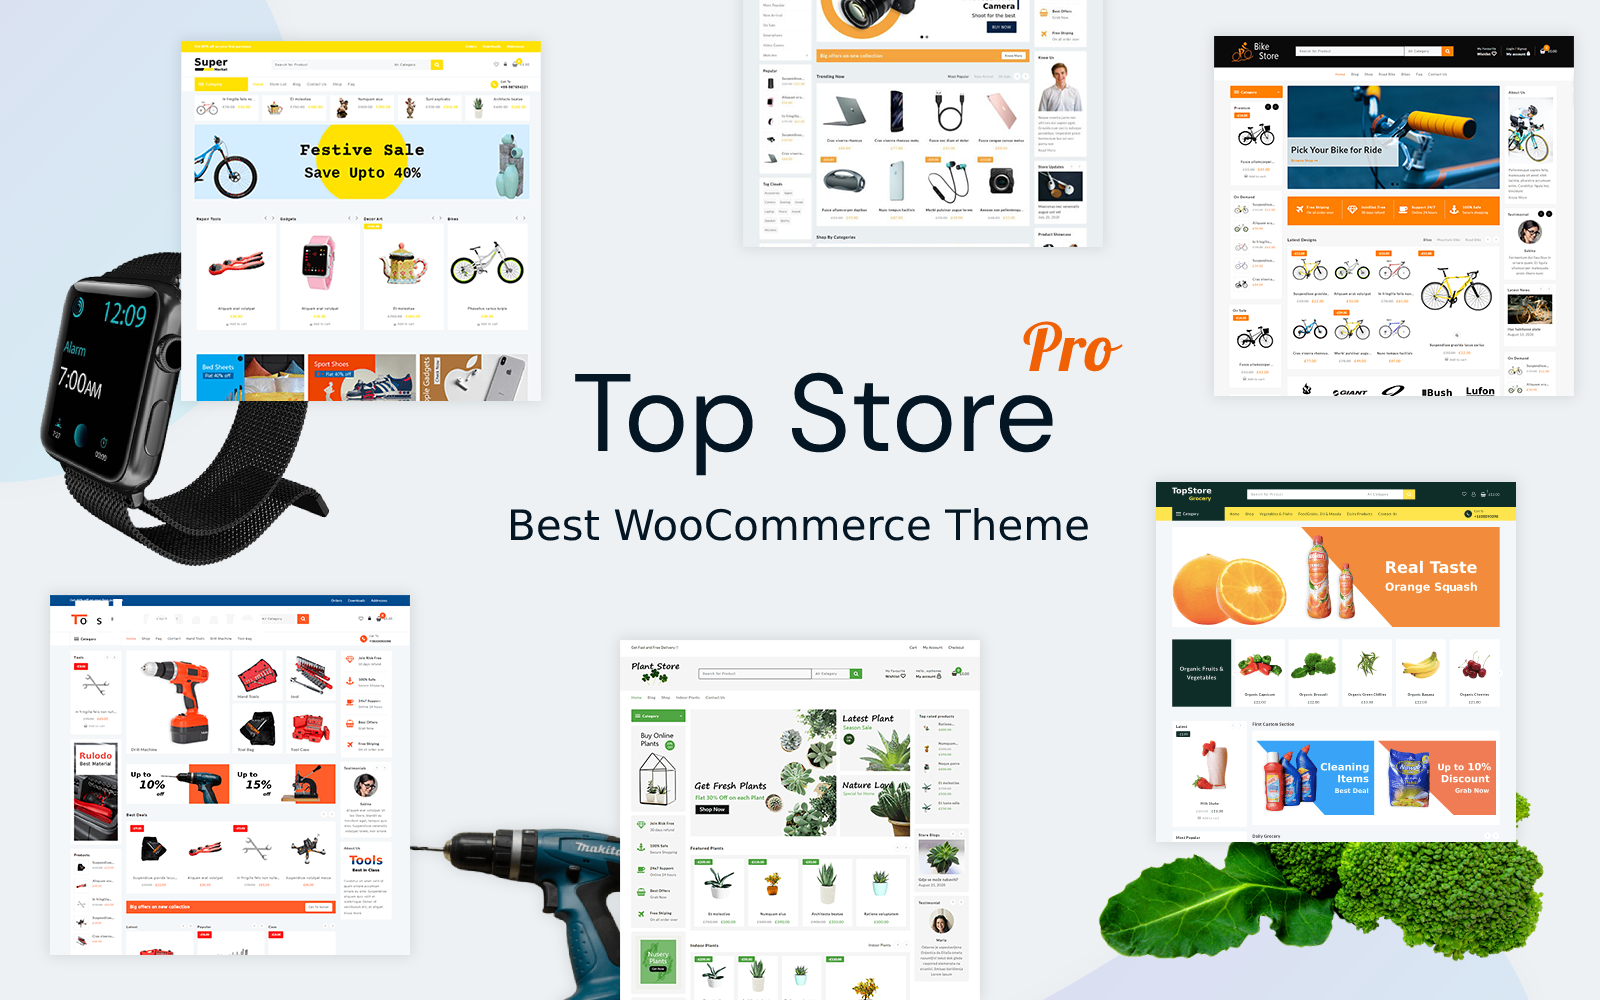 Top Store Pro - Best WooCommerce Theme